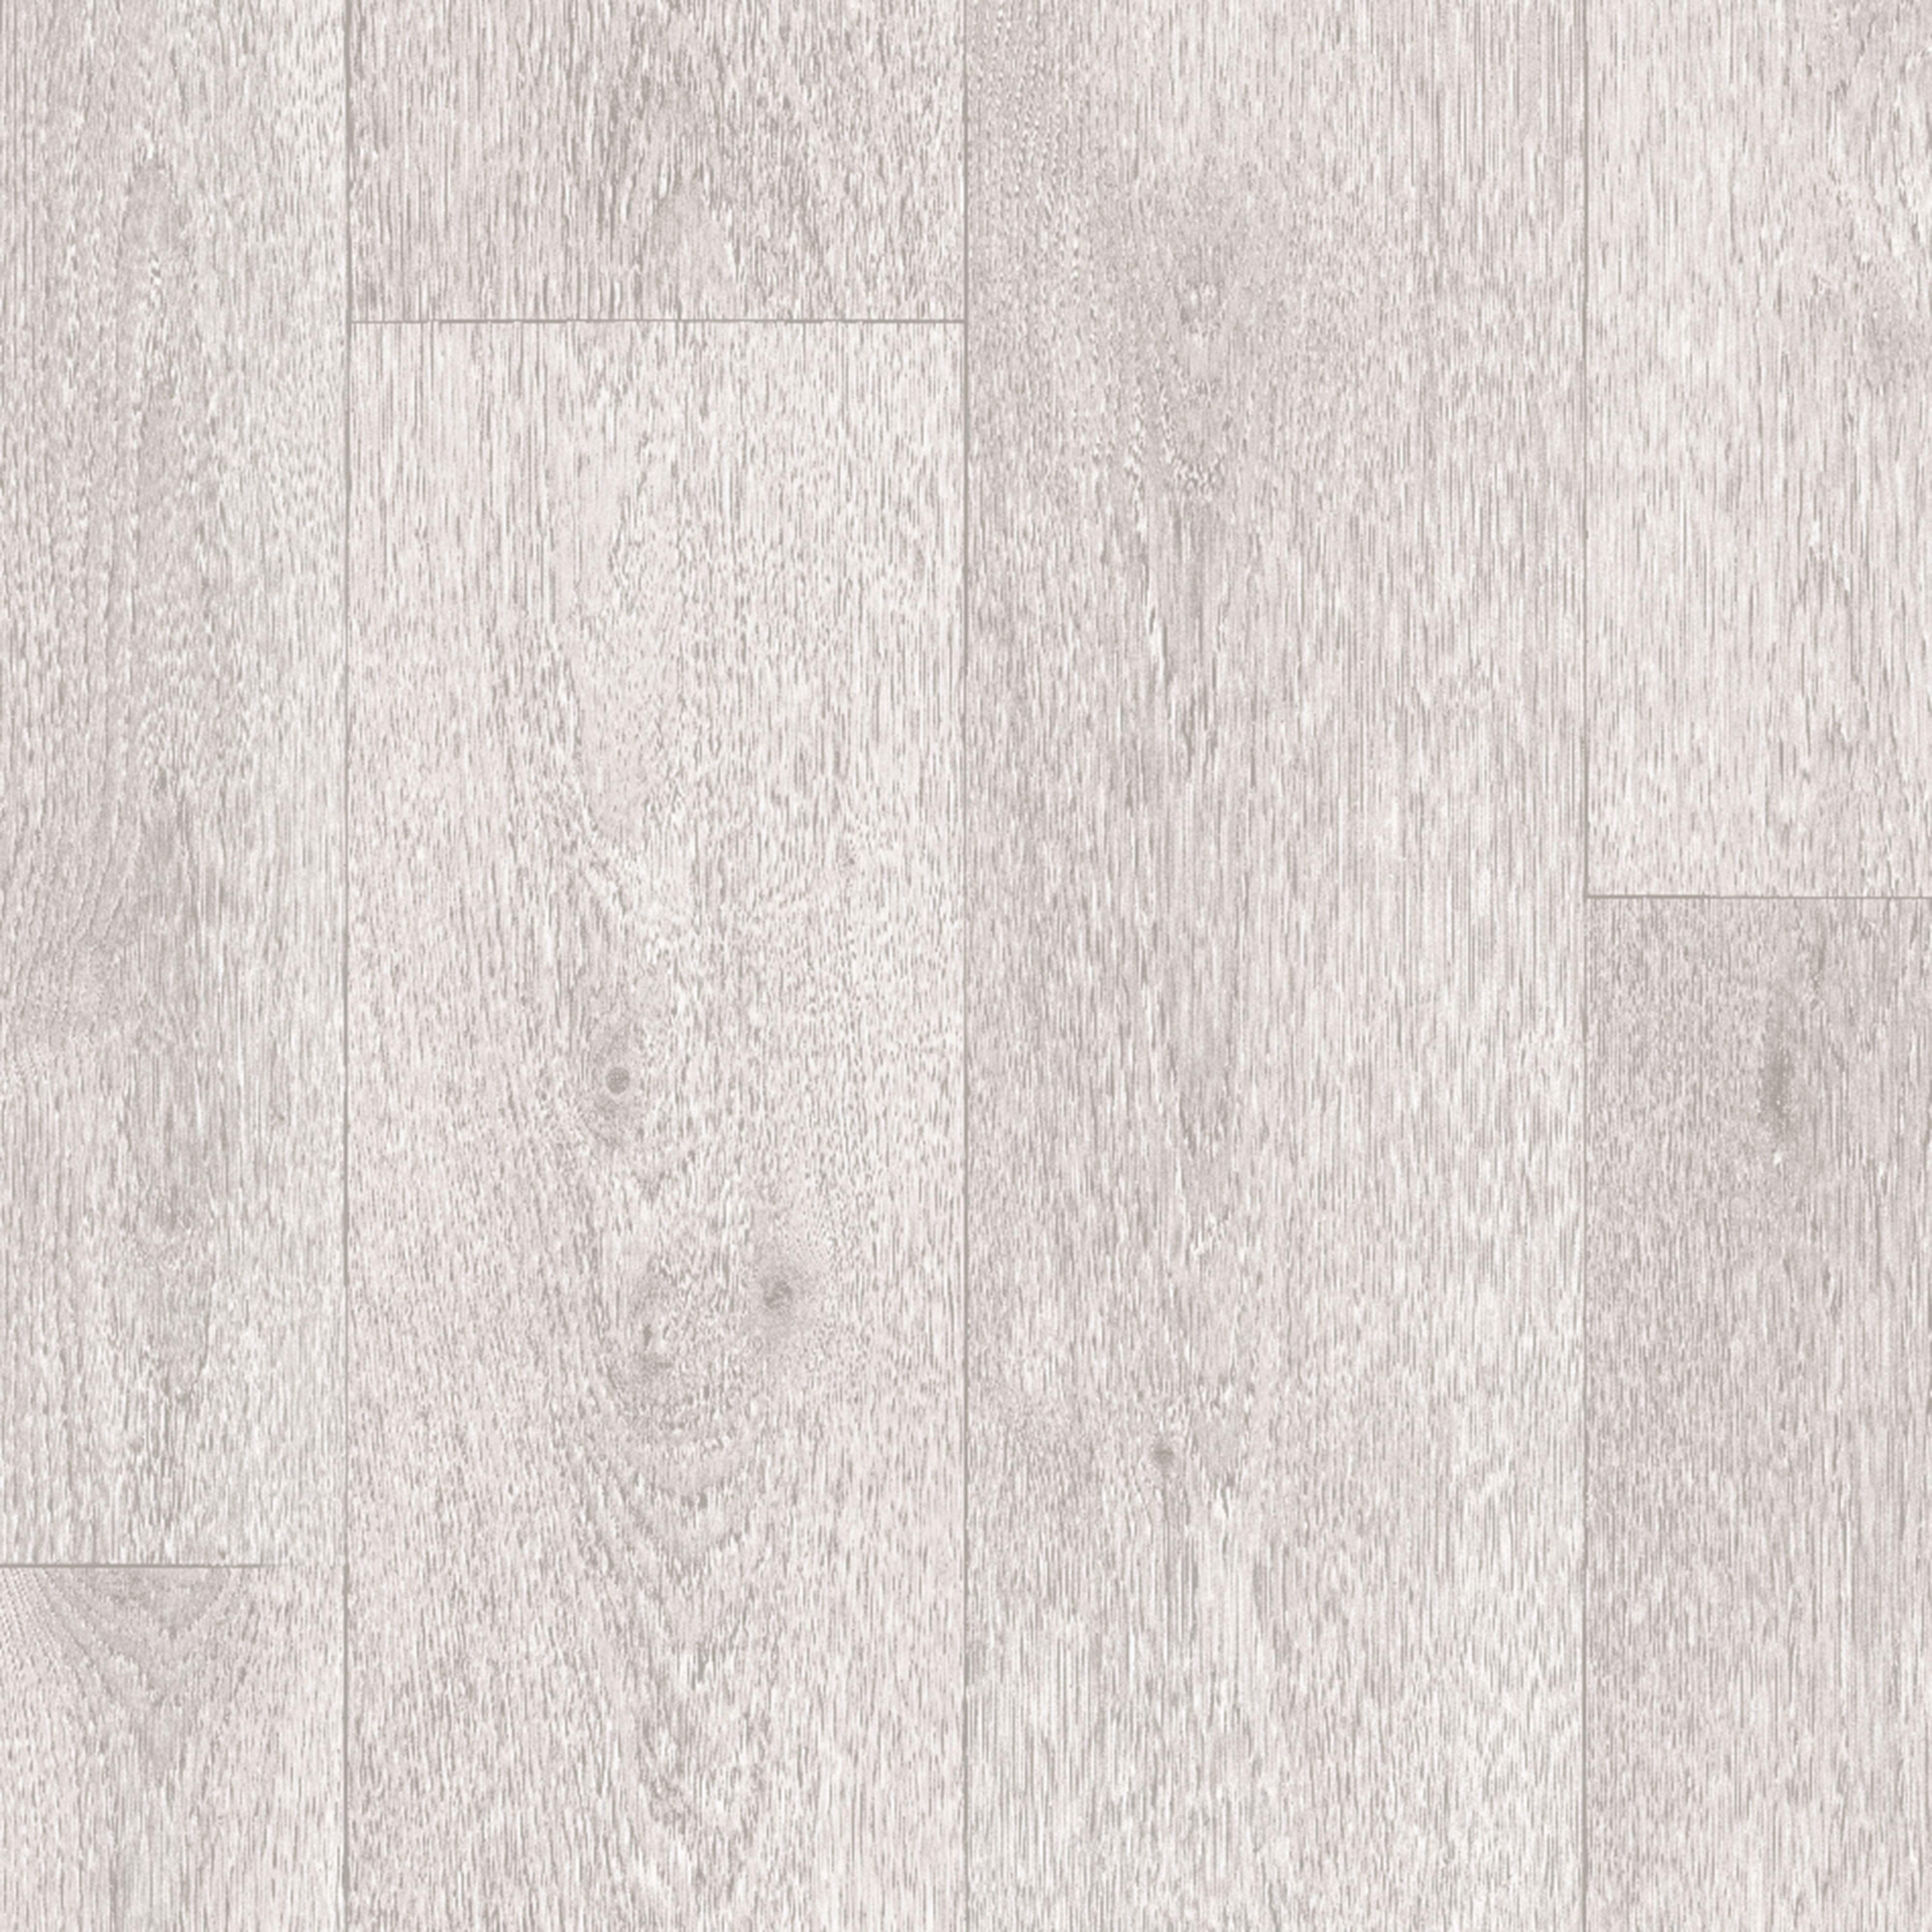 Bq Kitchen Floor Tiles Kennedy Black Vinyl 4ma2 Departments Diy At Bq